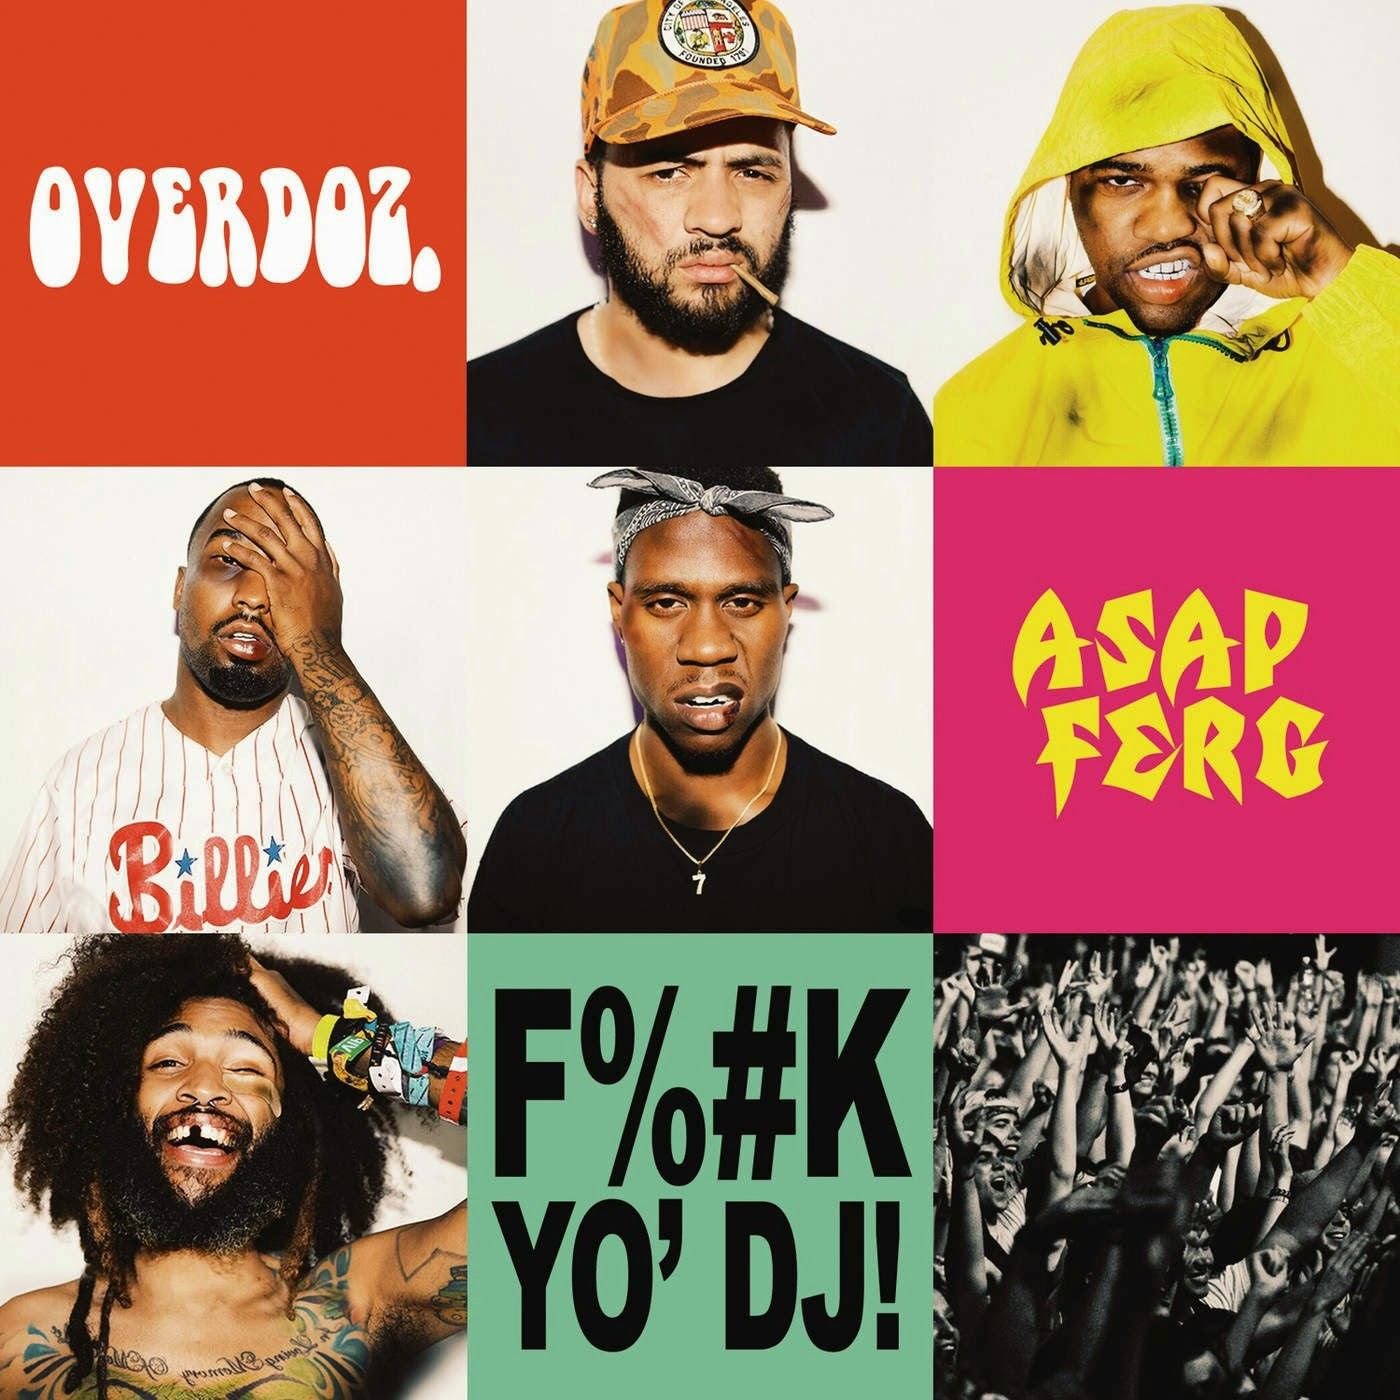 OverDoz.-~ censored ~ Yo DJ (feat. A$AP Ferg) (2015) 1080p